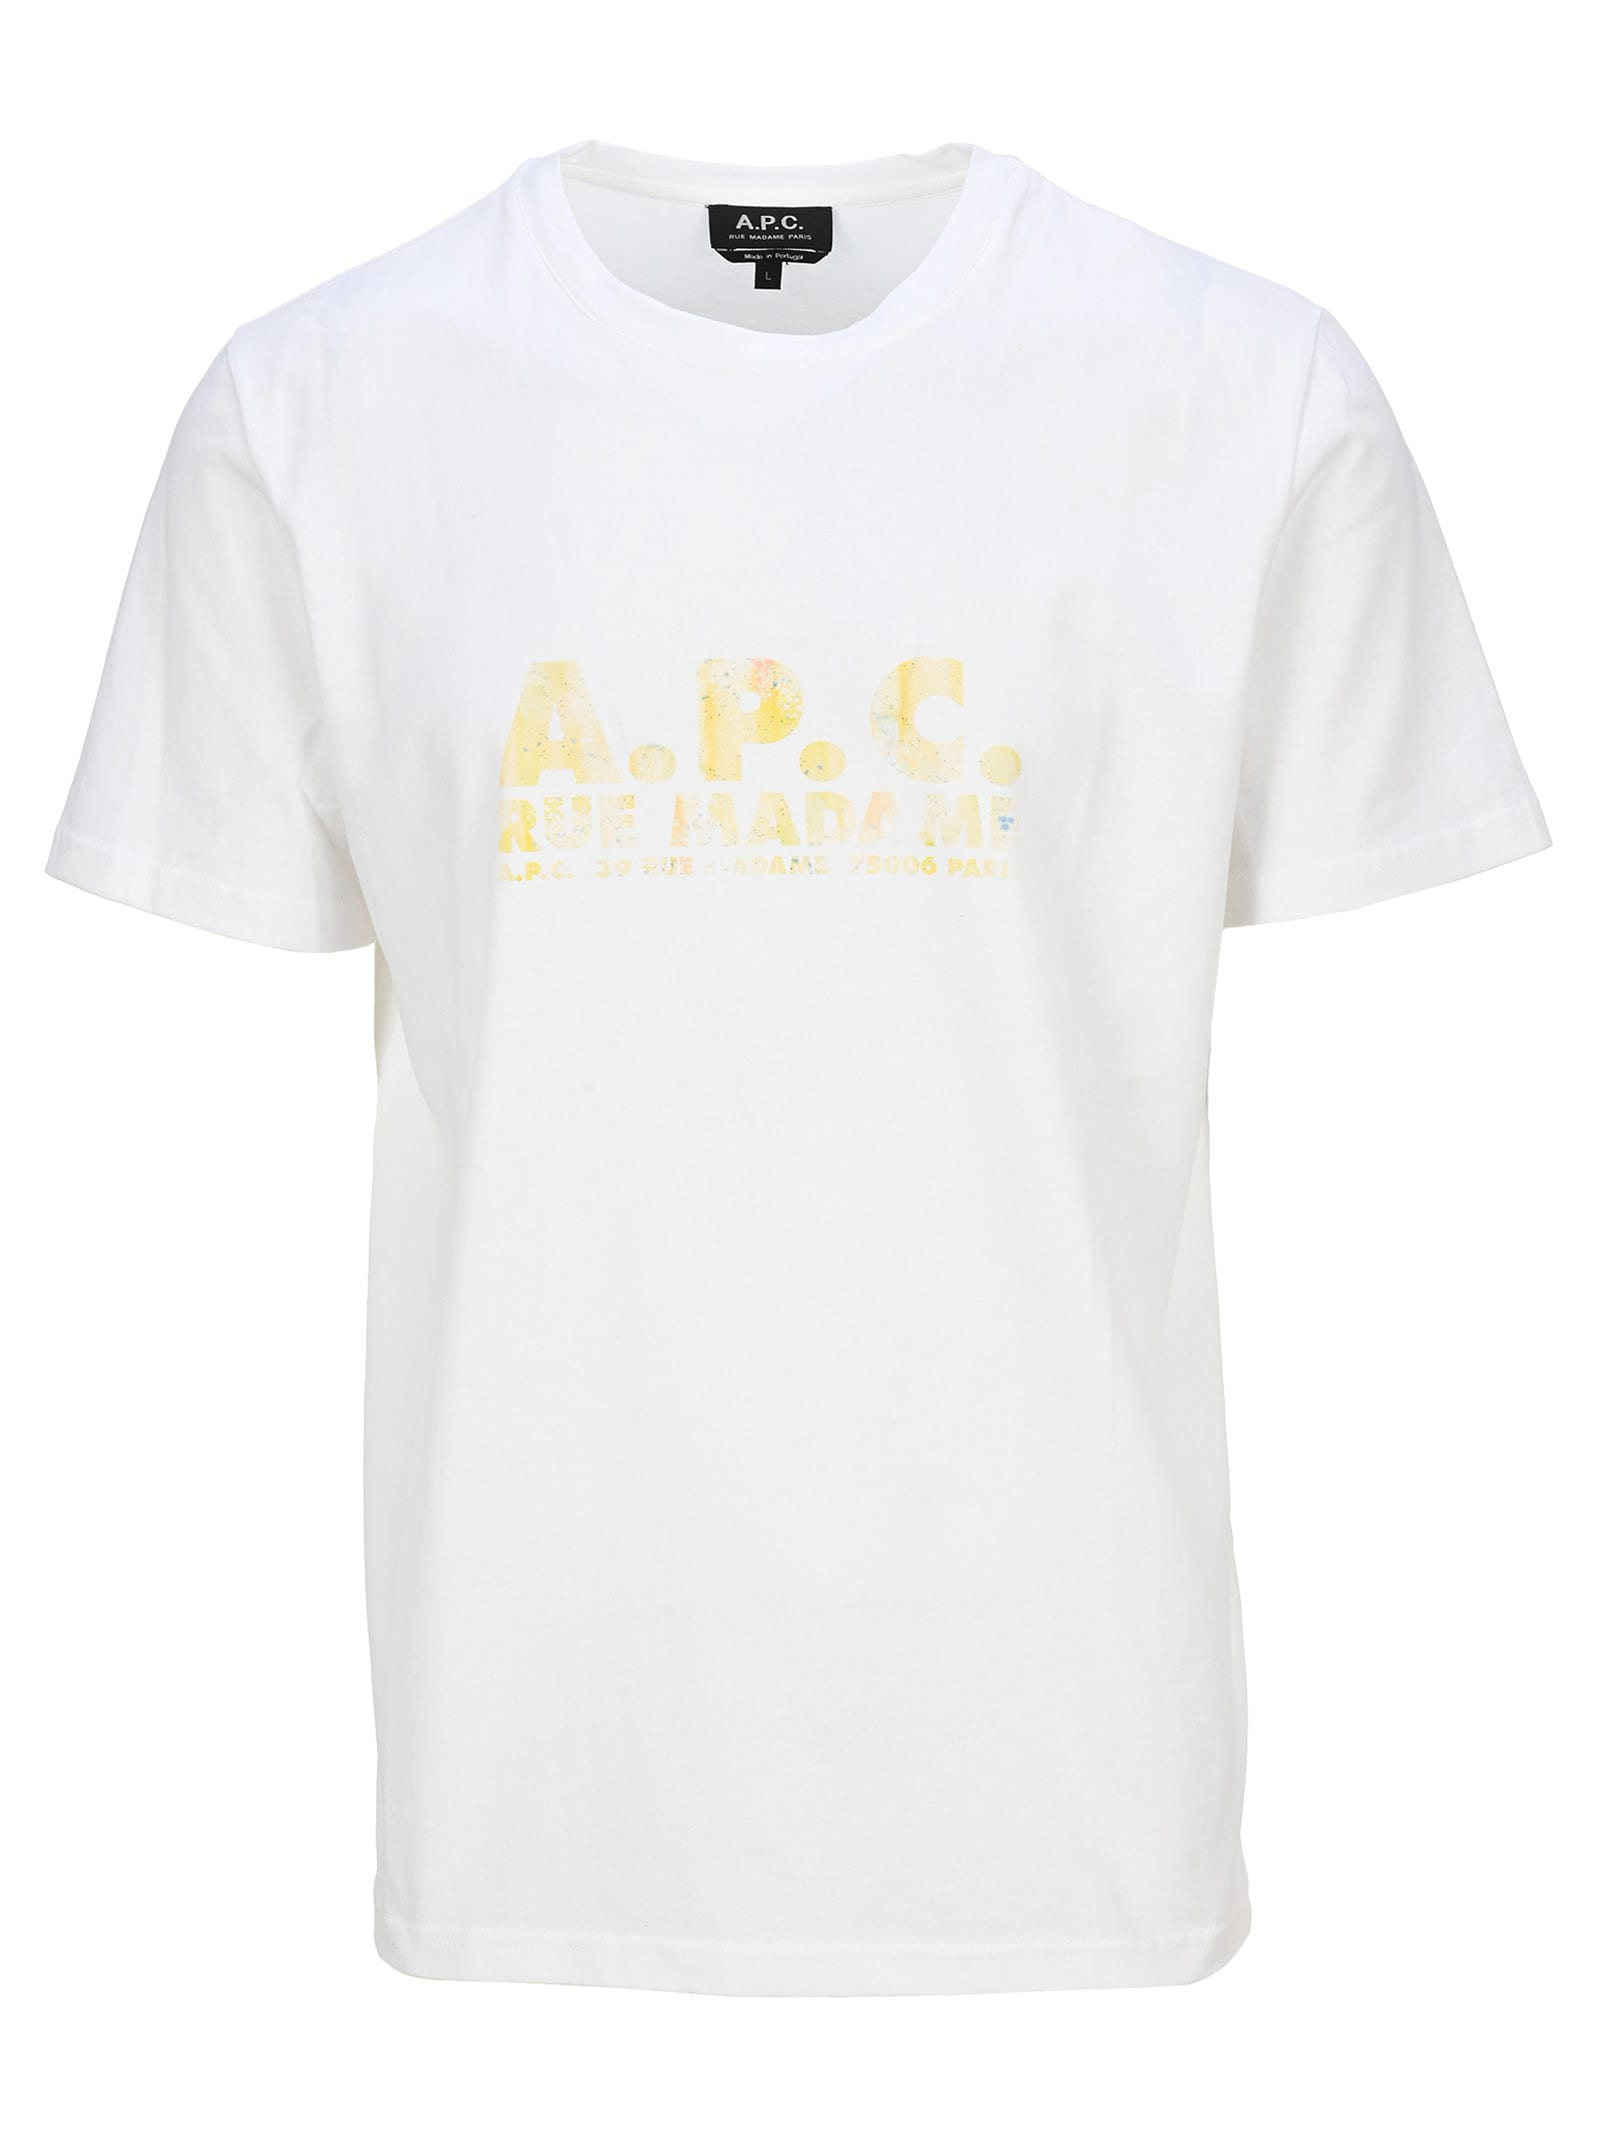 A.p.c. A.P.C. LOGO-PRINT CREW NECK T-SHIRT